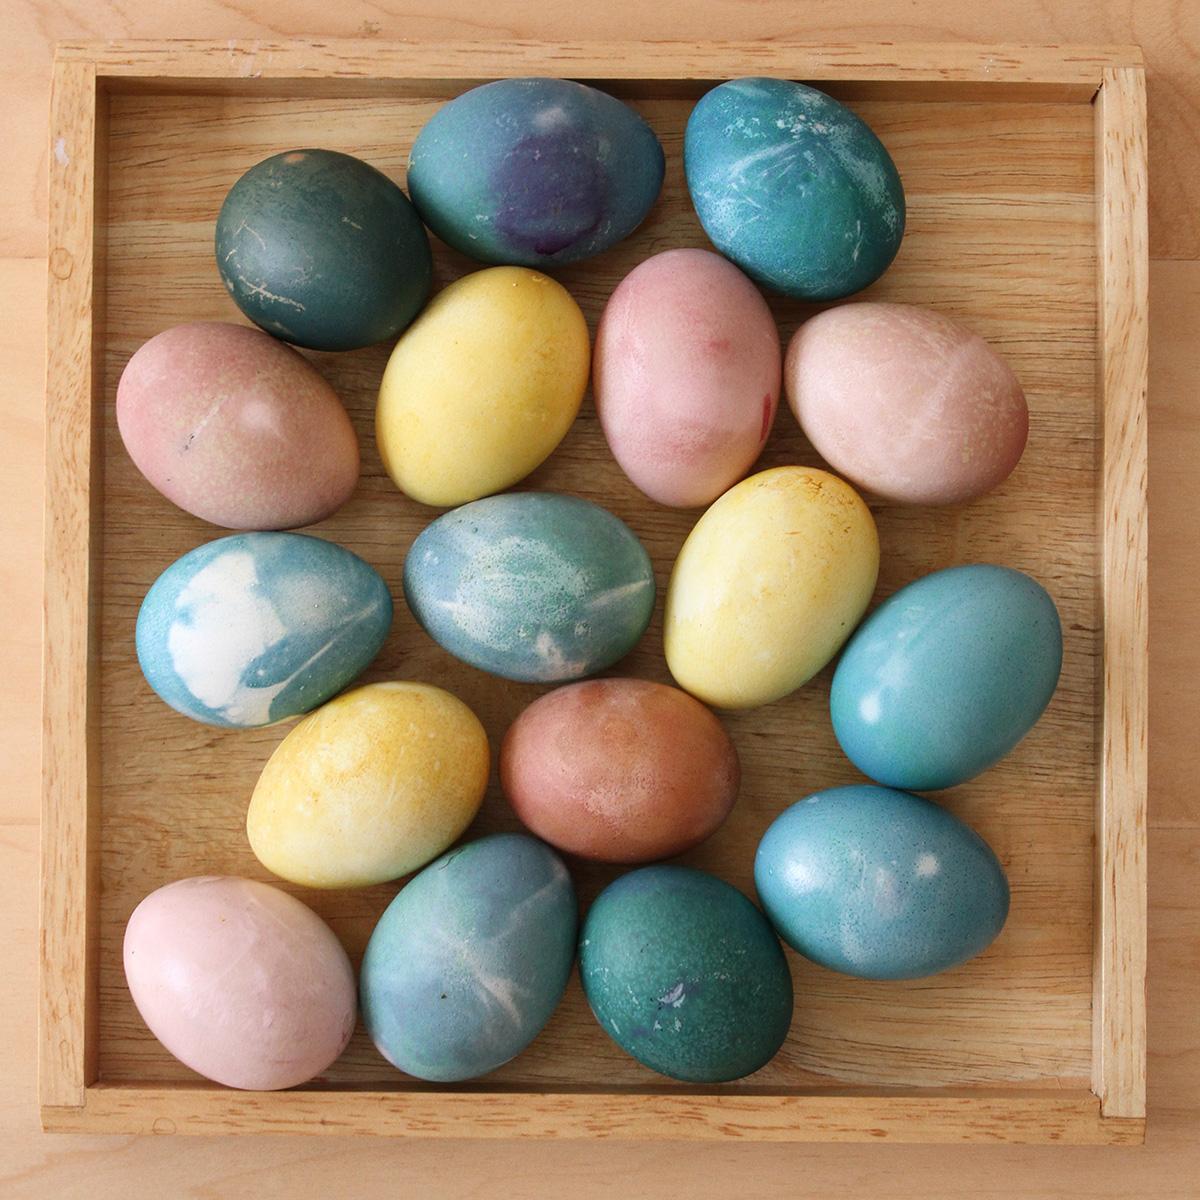 eggs5